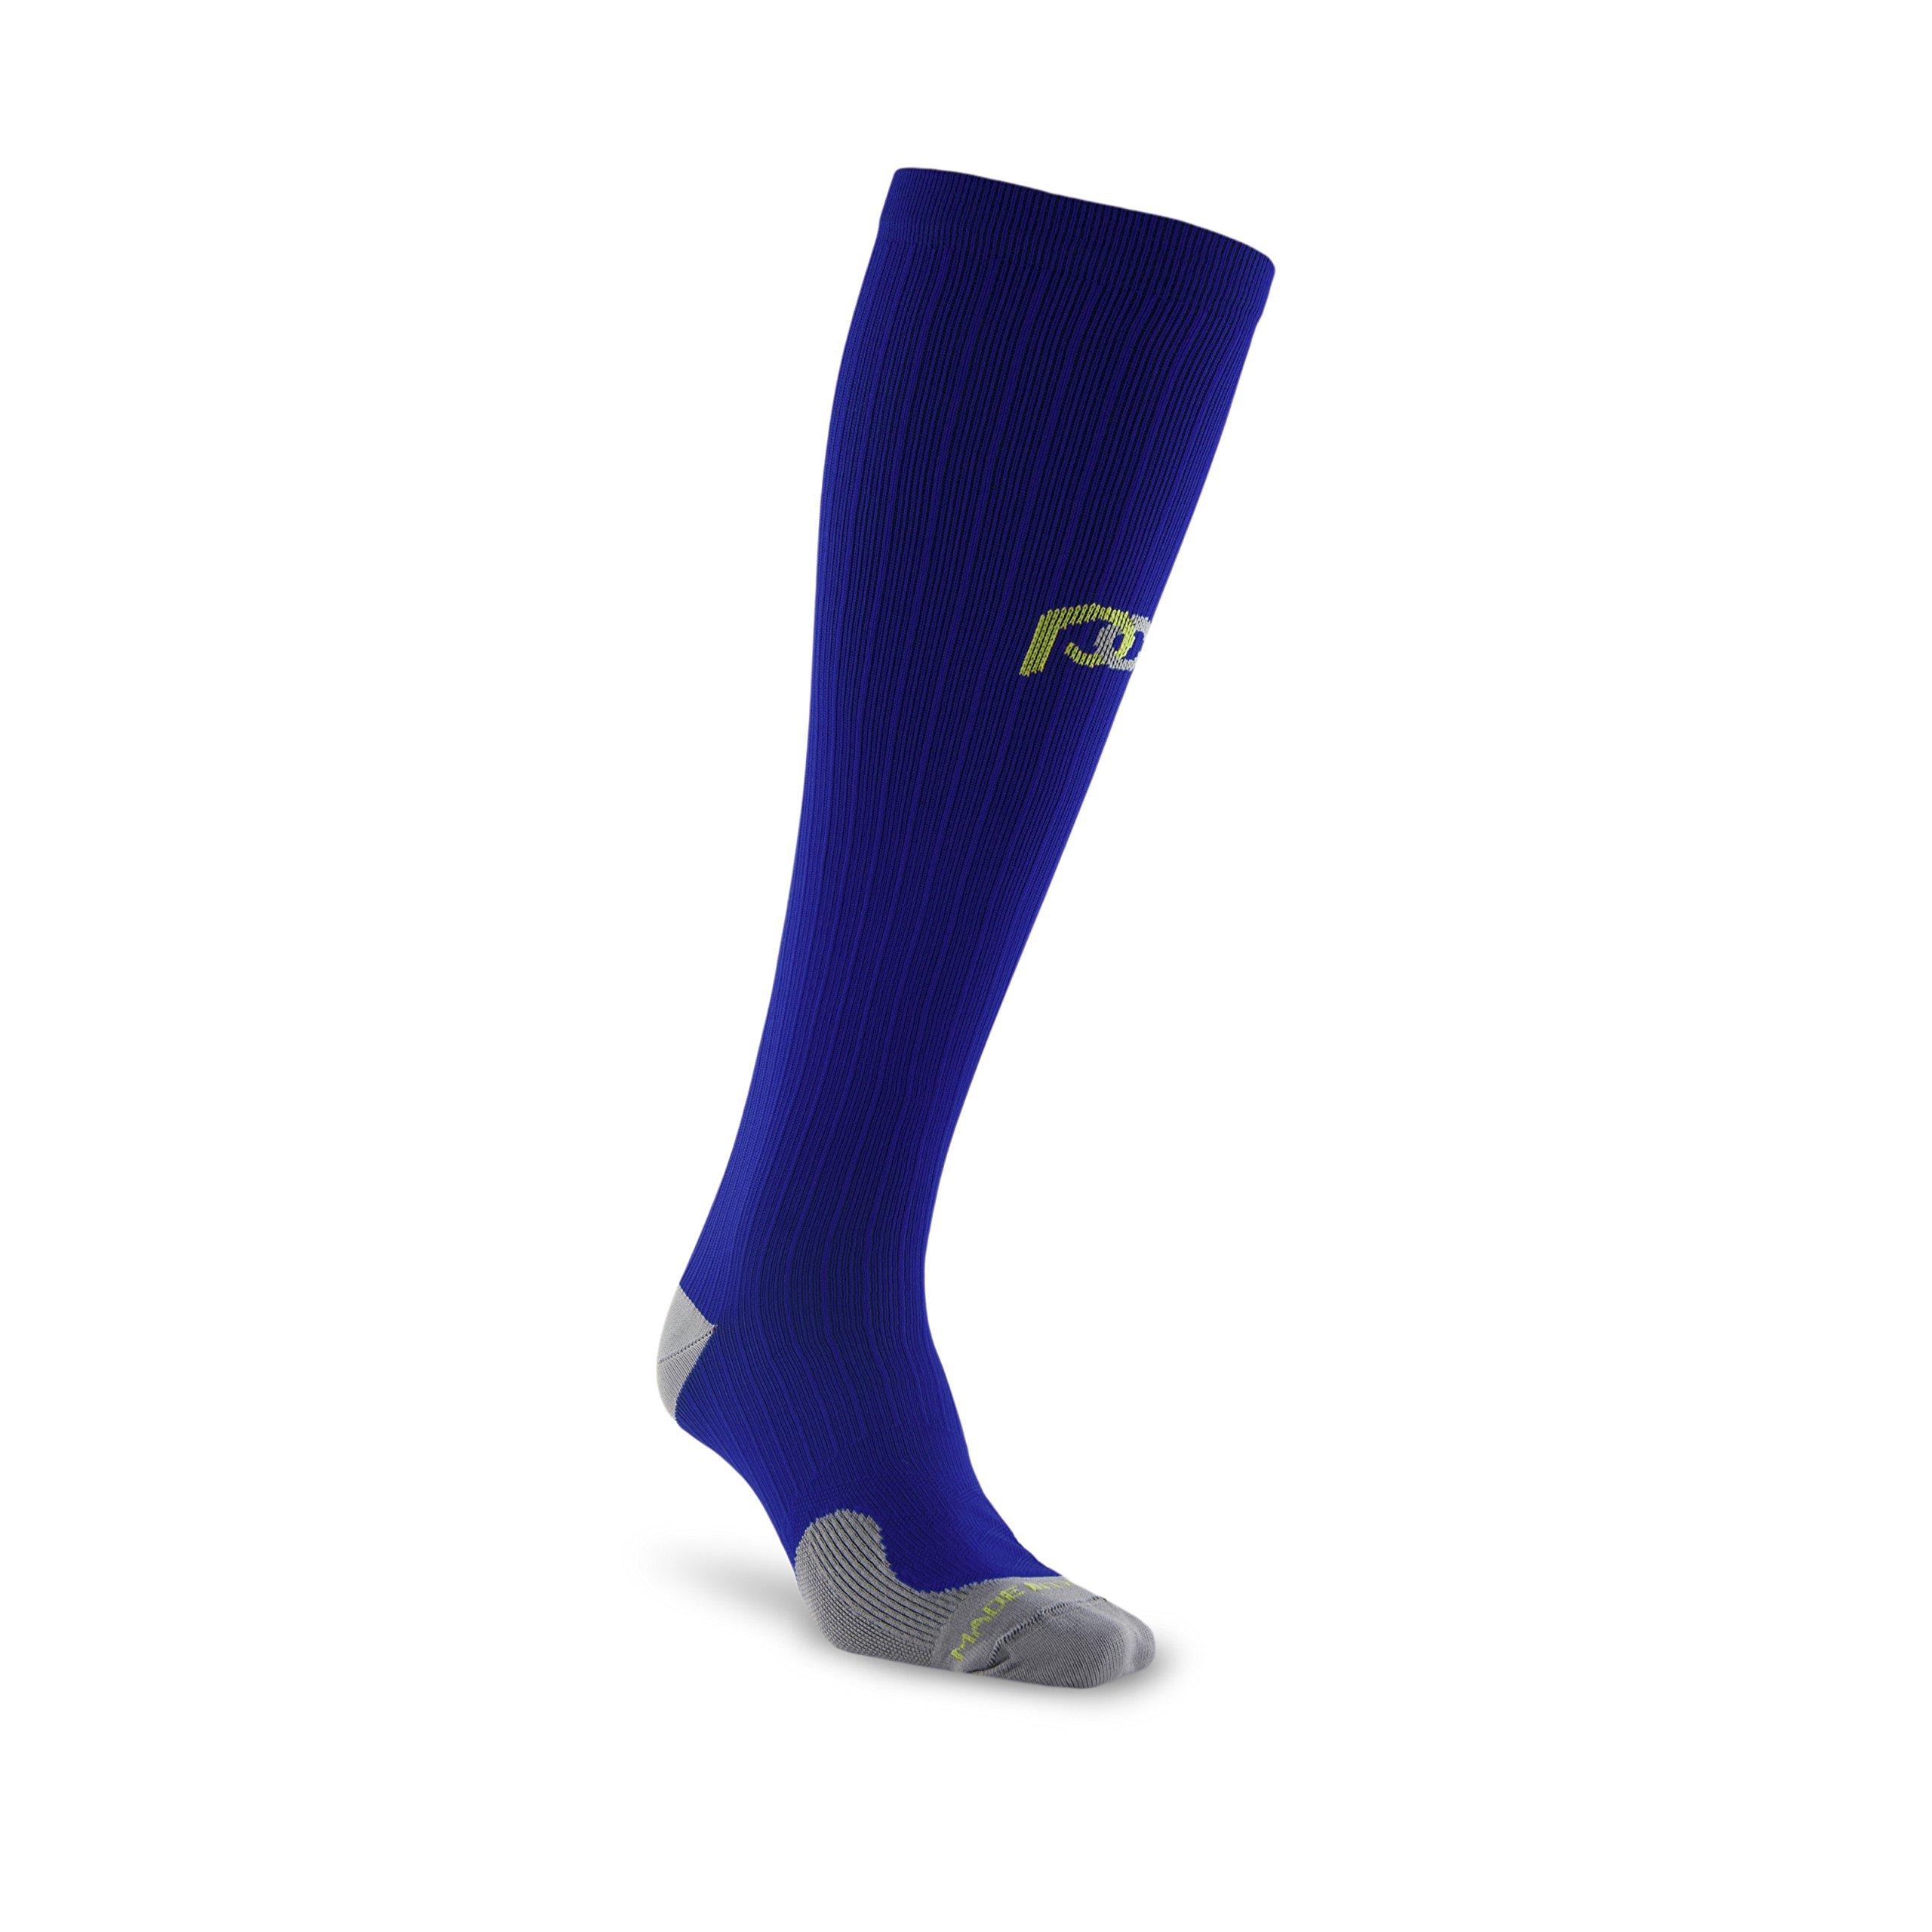 PRO Compression: Marathon (Full-Length, Over-the-Calf) Compression Socks, Royal Blue, Small/Medium by PRO Compression